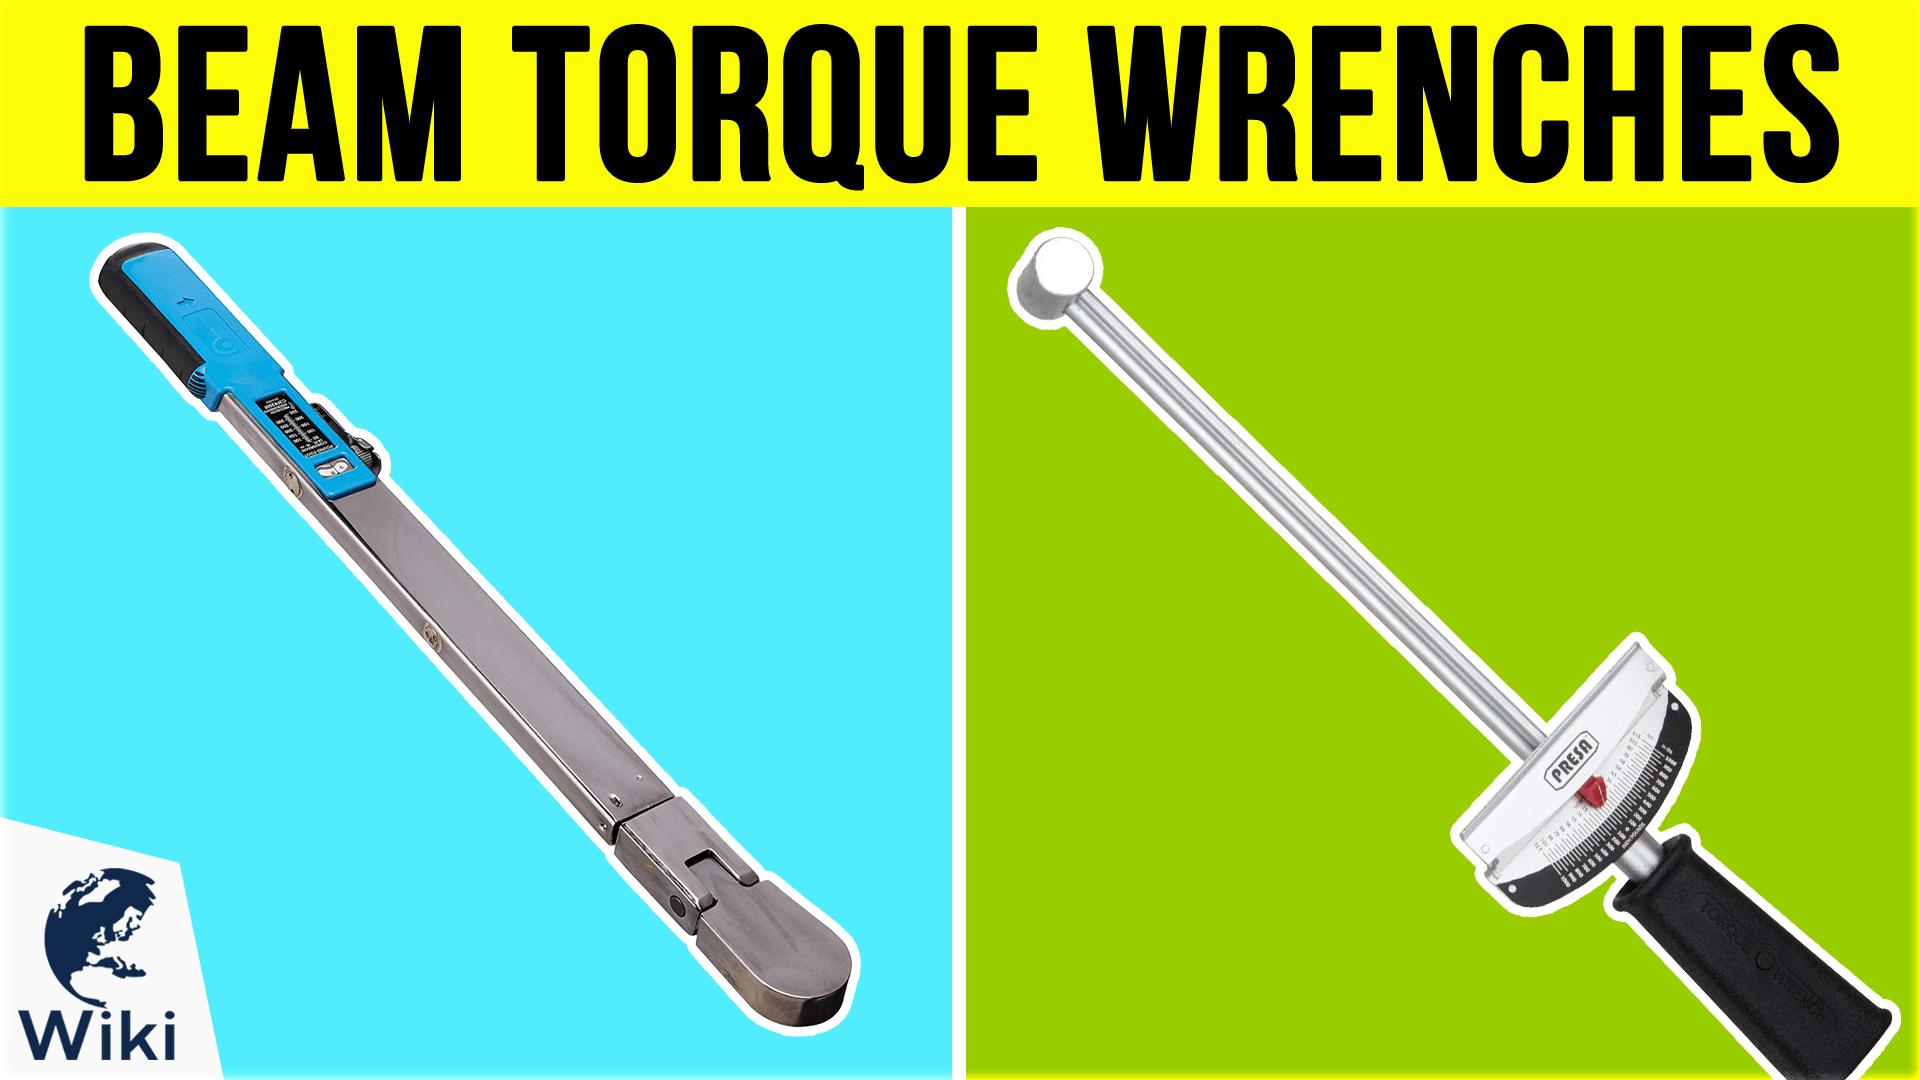 "1//4/"" Drive 20-150 in.lbs Comfort Grip Handle Torque Wrench CDI #1501MRPH USA"